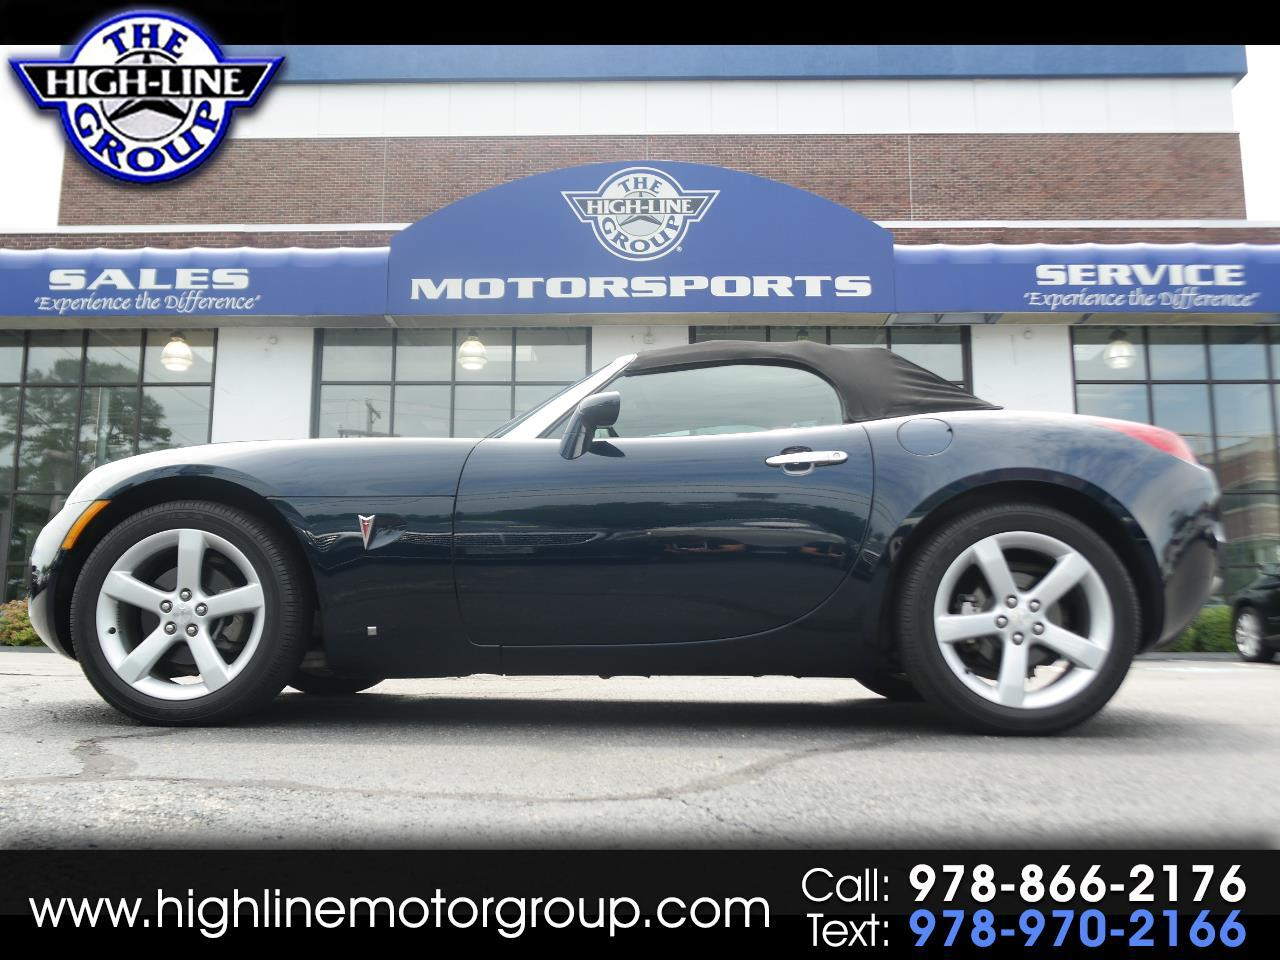 2006 Pontiac Solstice 2dr Convertible